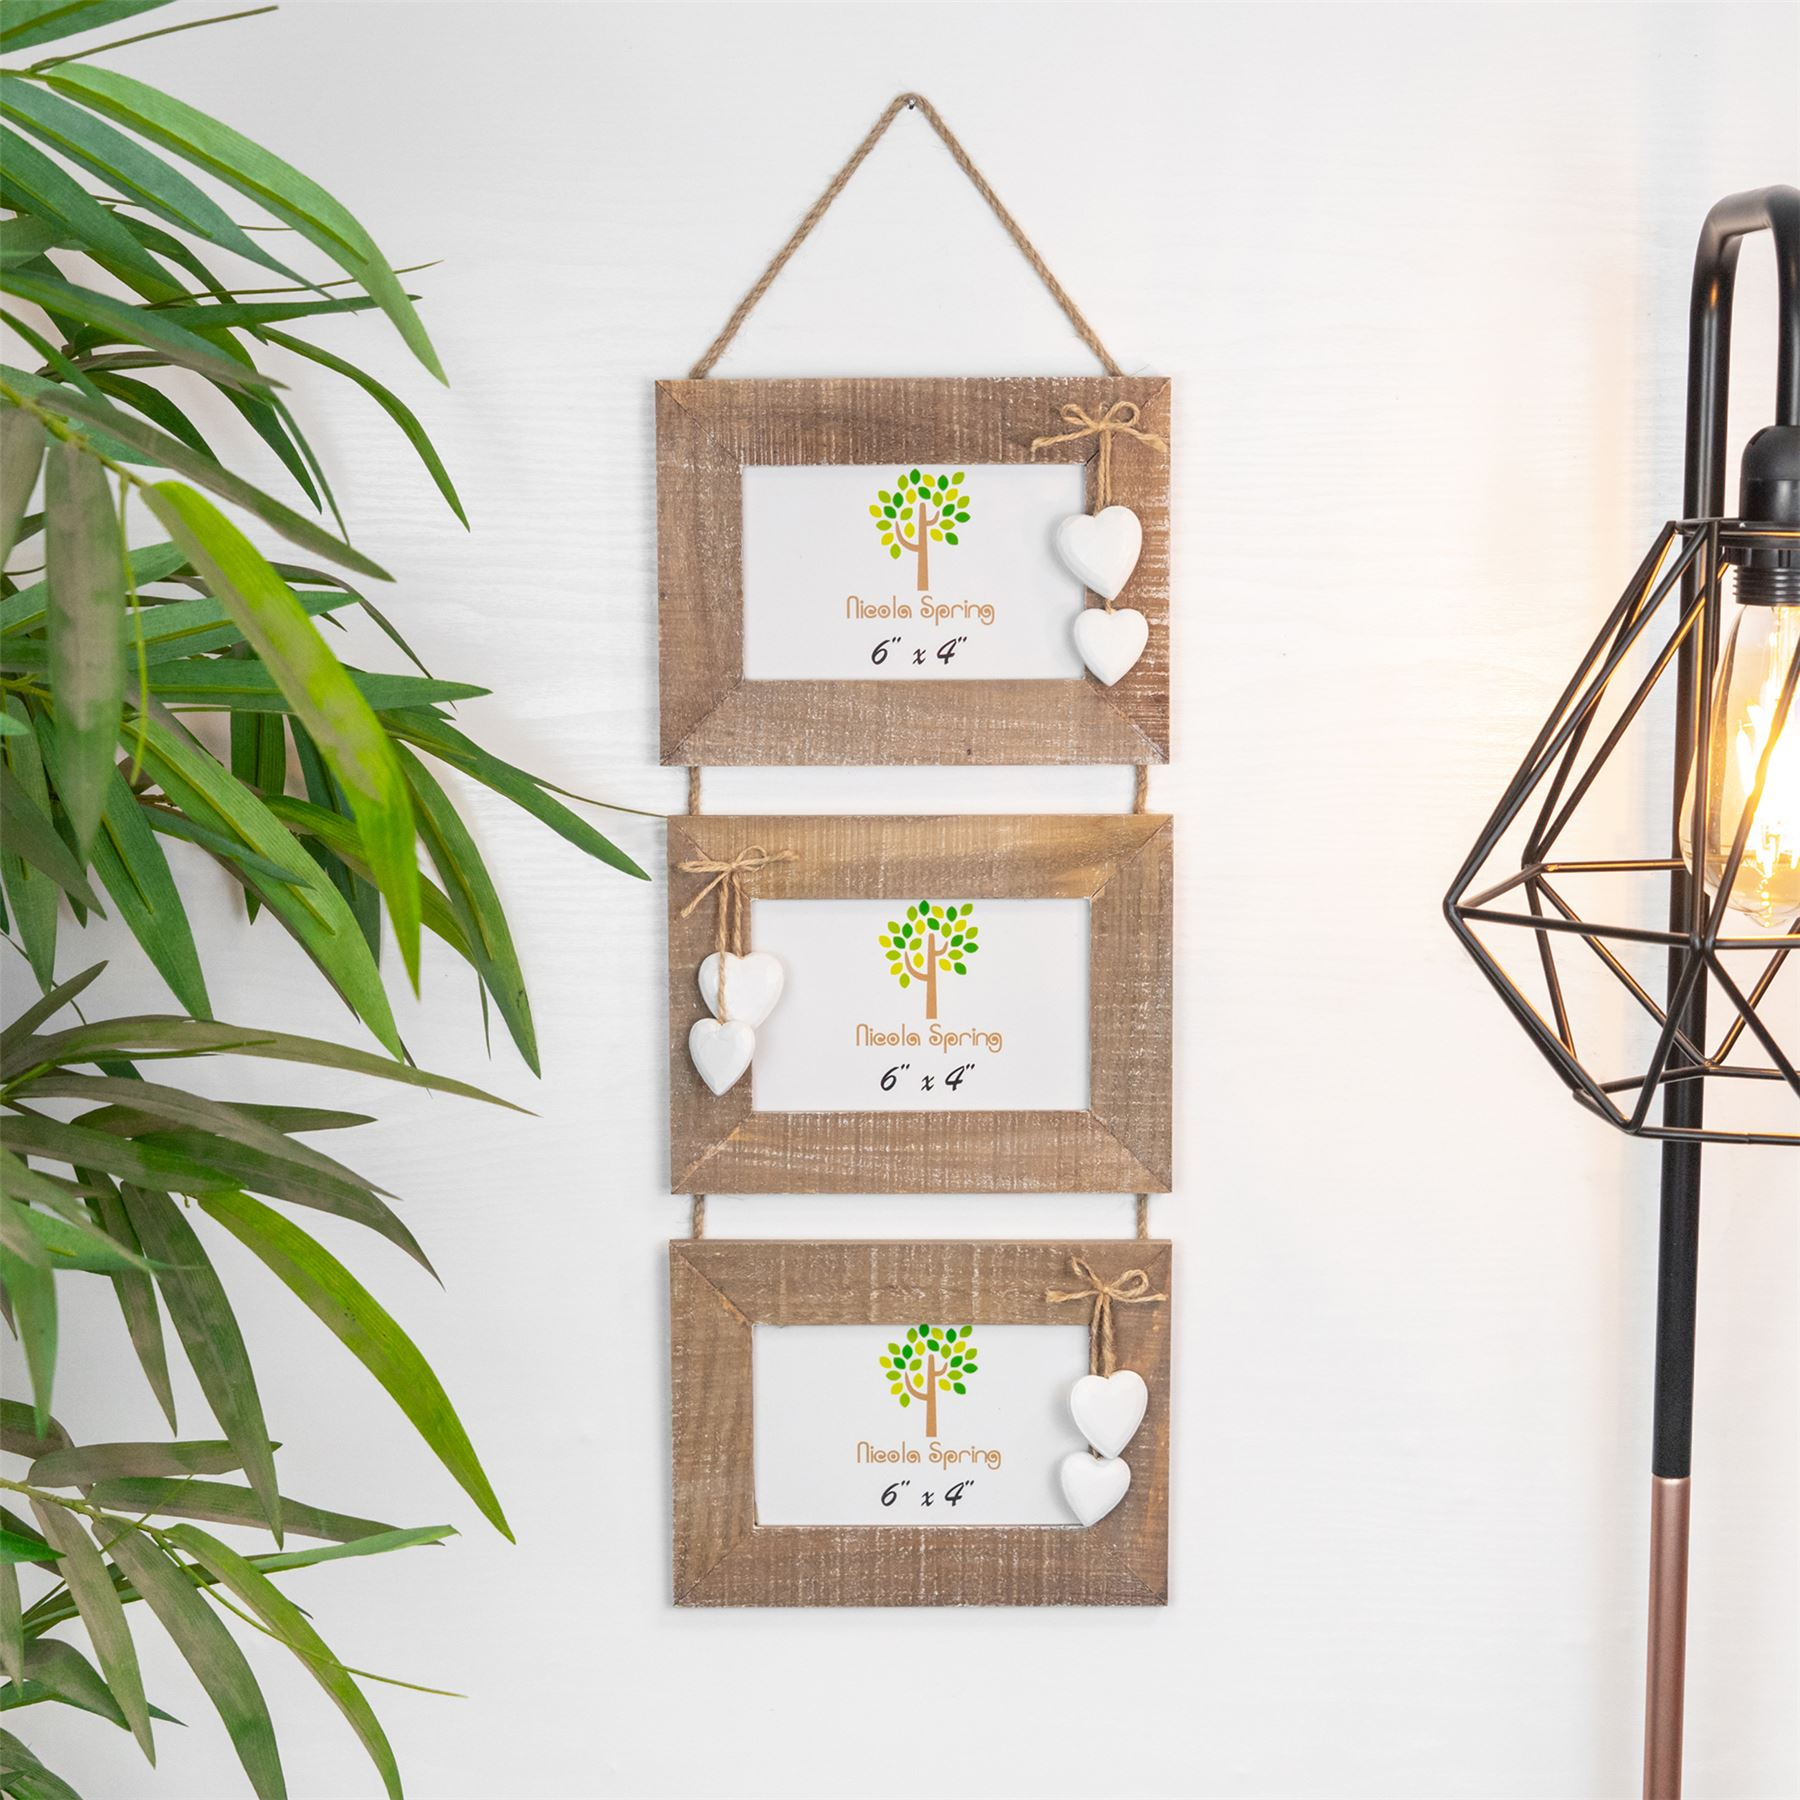 Shabby Chic Bois Bois Flotte Triple Hanging Coeurs Blanc Cadre Photo